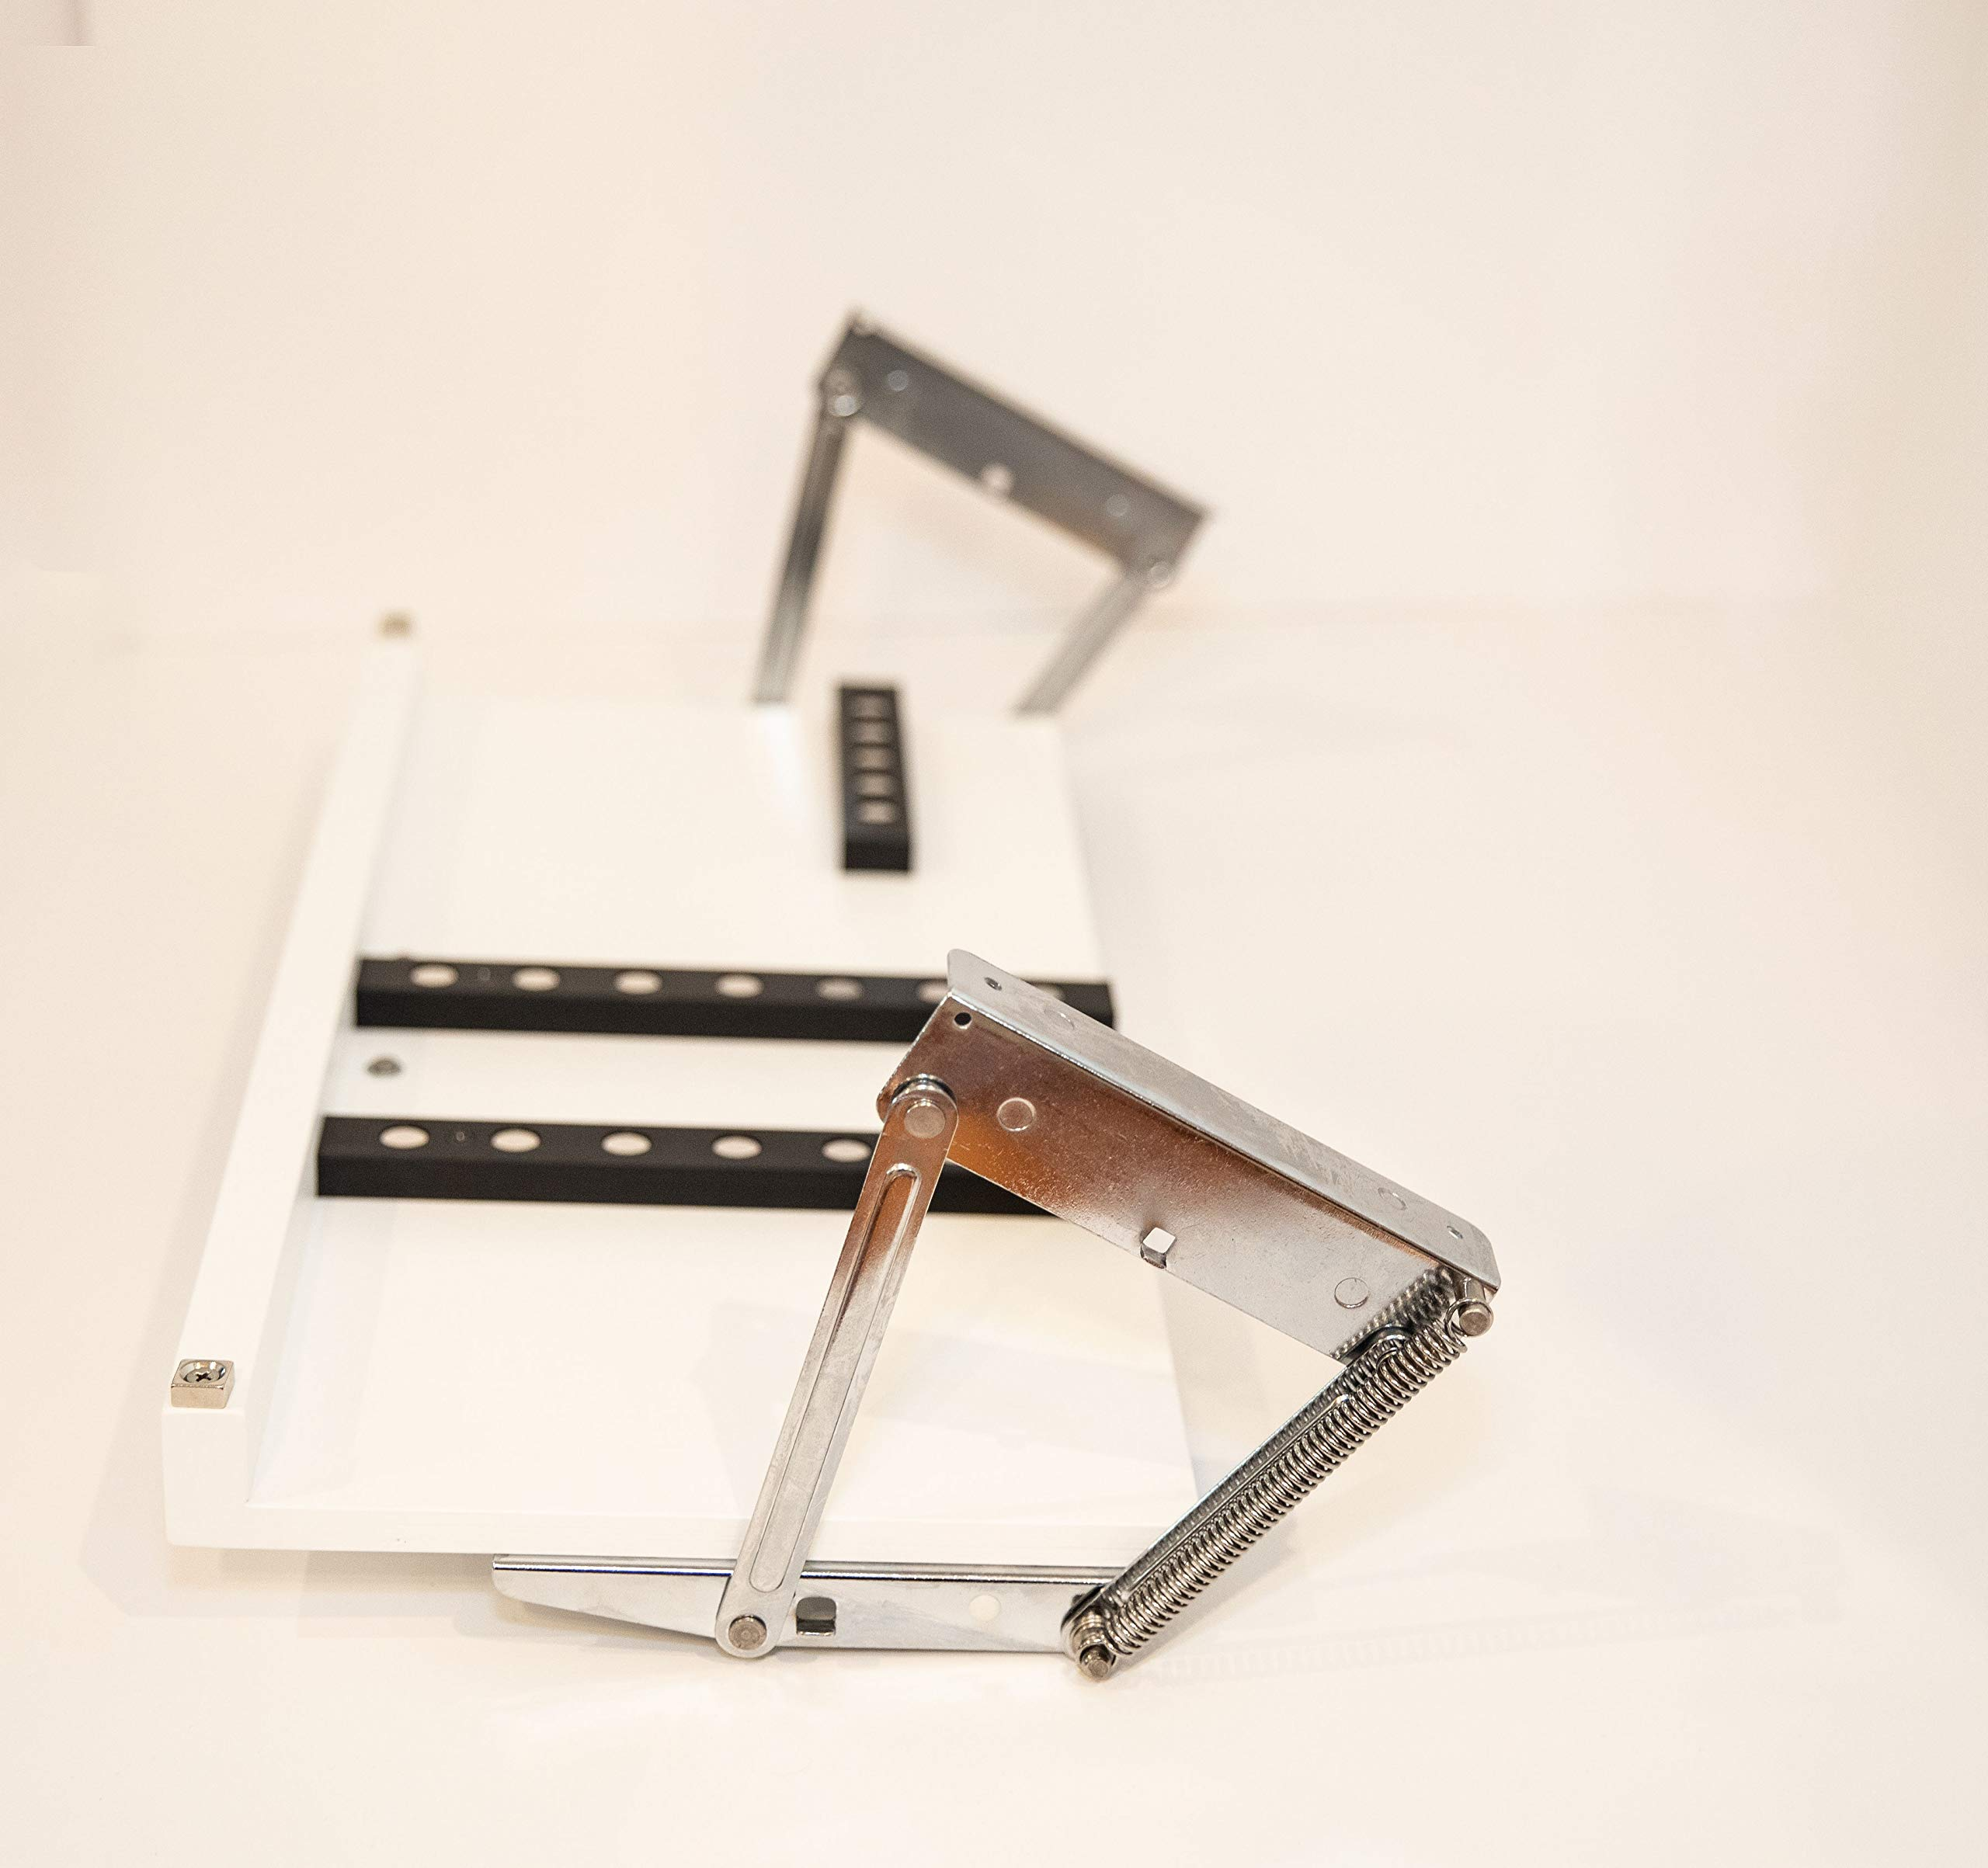 Under Cabinet Knife Block - Large Shown - 3 Sizes Available & 5 Finishes (X-Large, White)